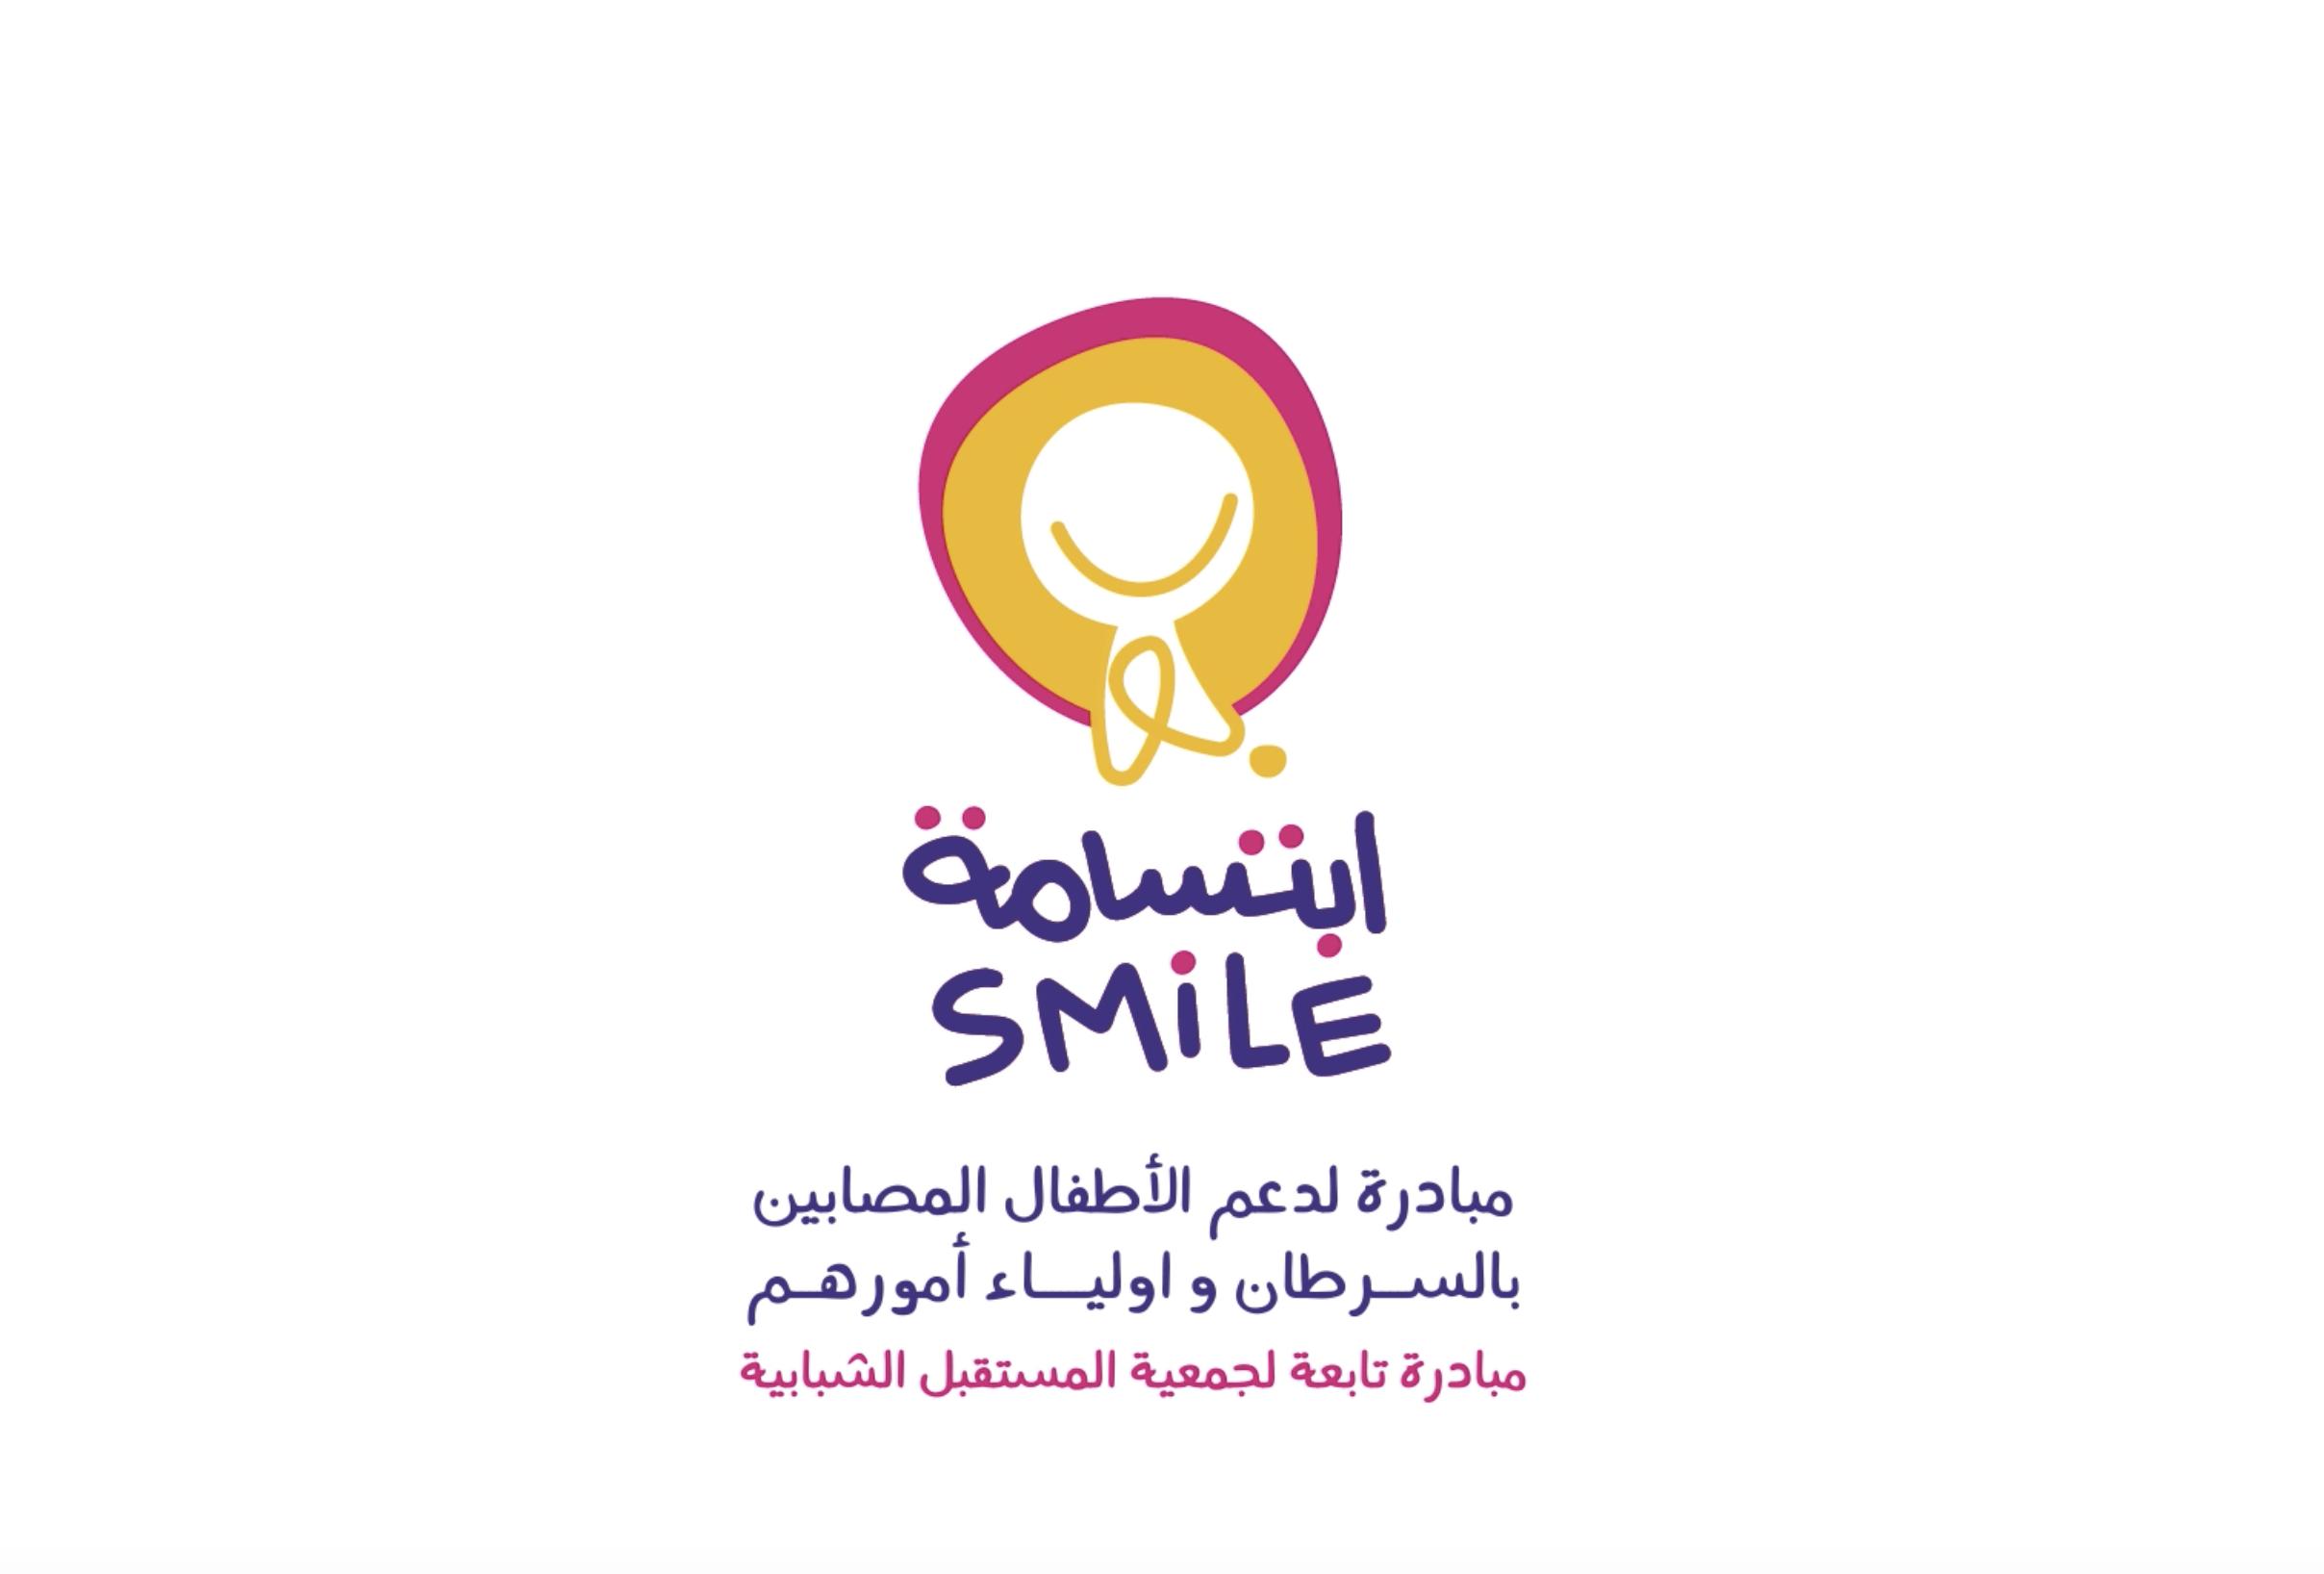 smile of bahrain new logo شعار مبادرة ابتسامه لدعم الاطفال المرضى بالسرطان البحرين